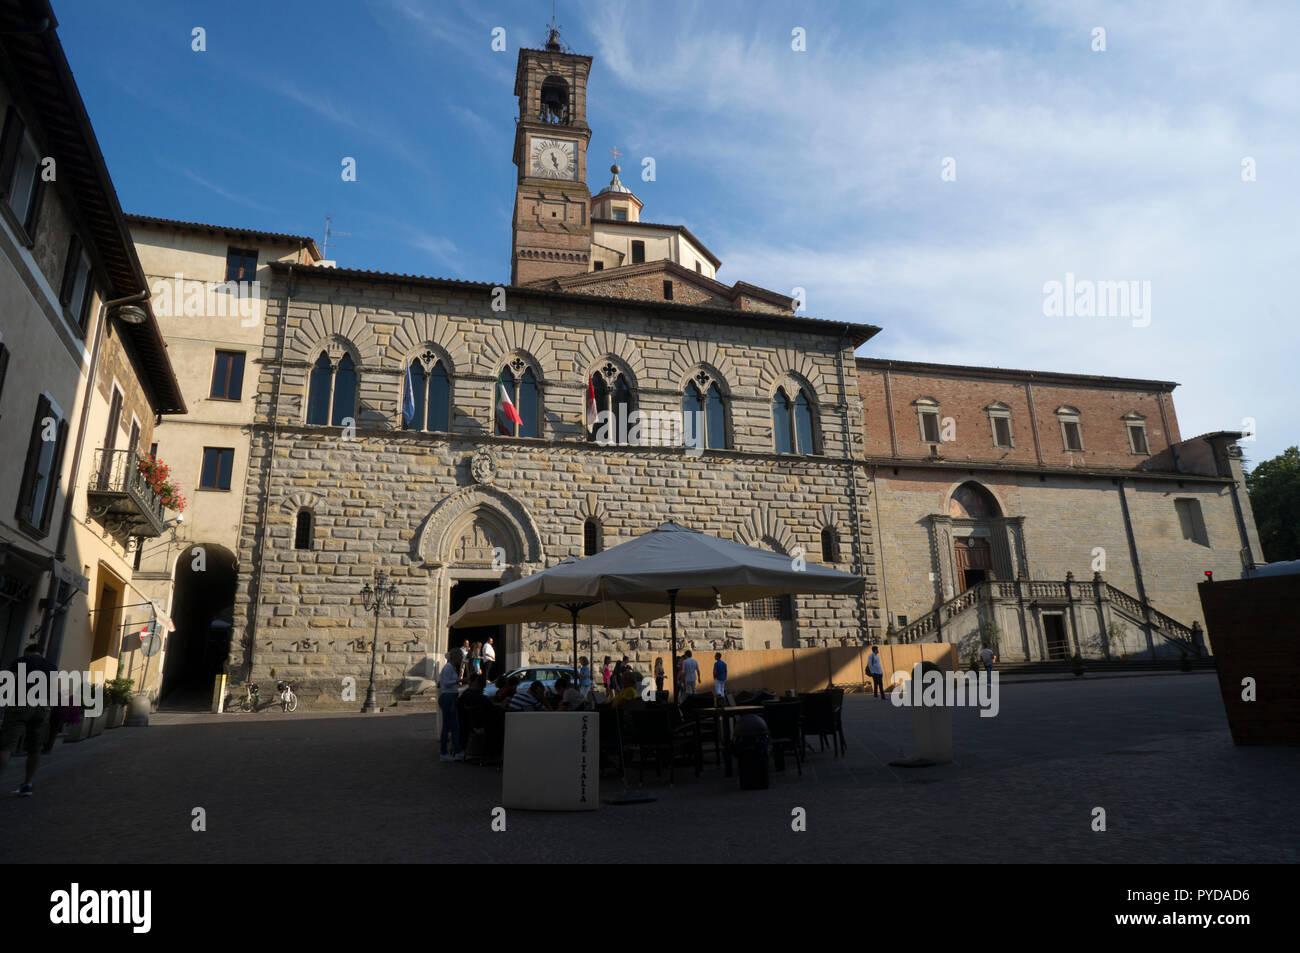 Citta' di castello, Perugia, Italy - Stock Image